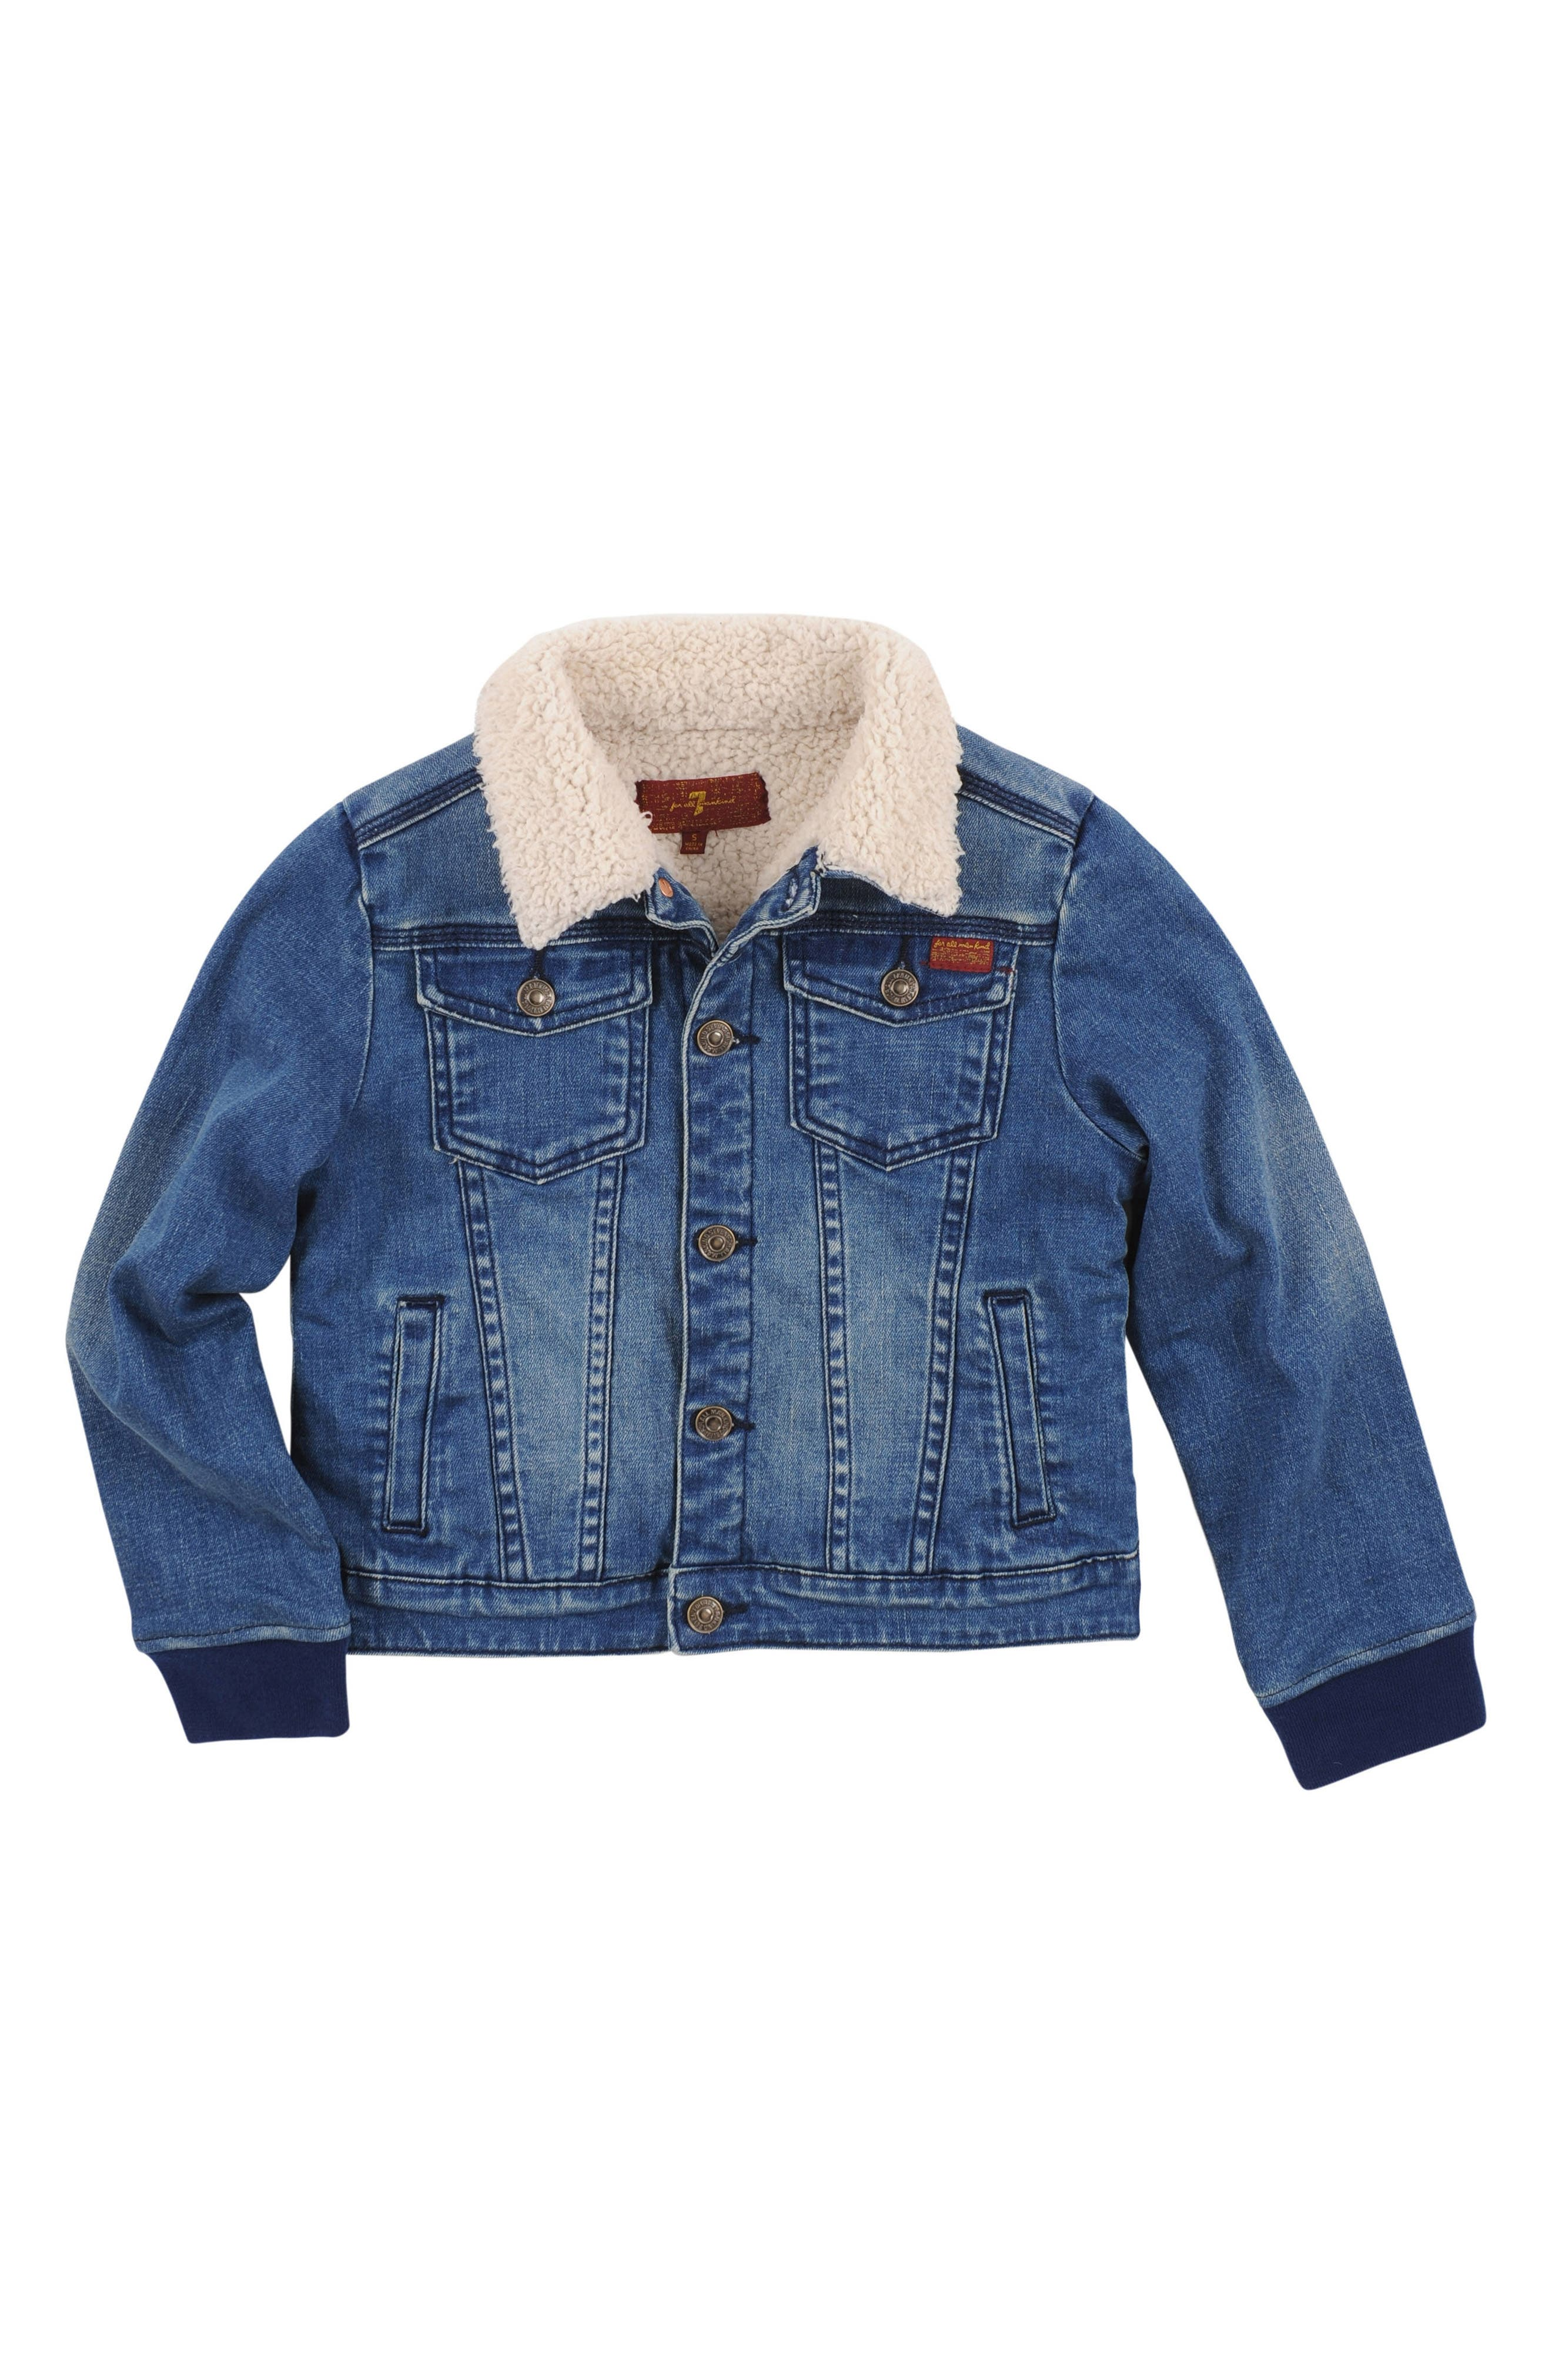 Fleece Lined Denim Jacket,                             Main thumbnail 1, color,                             244